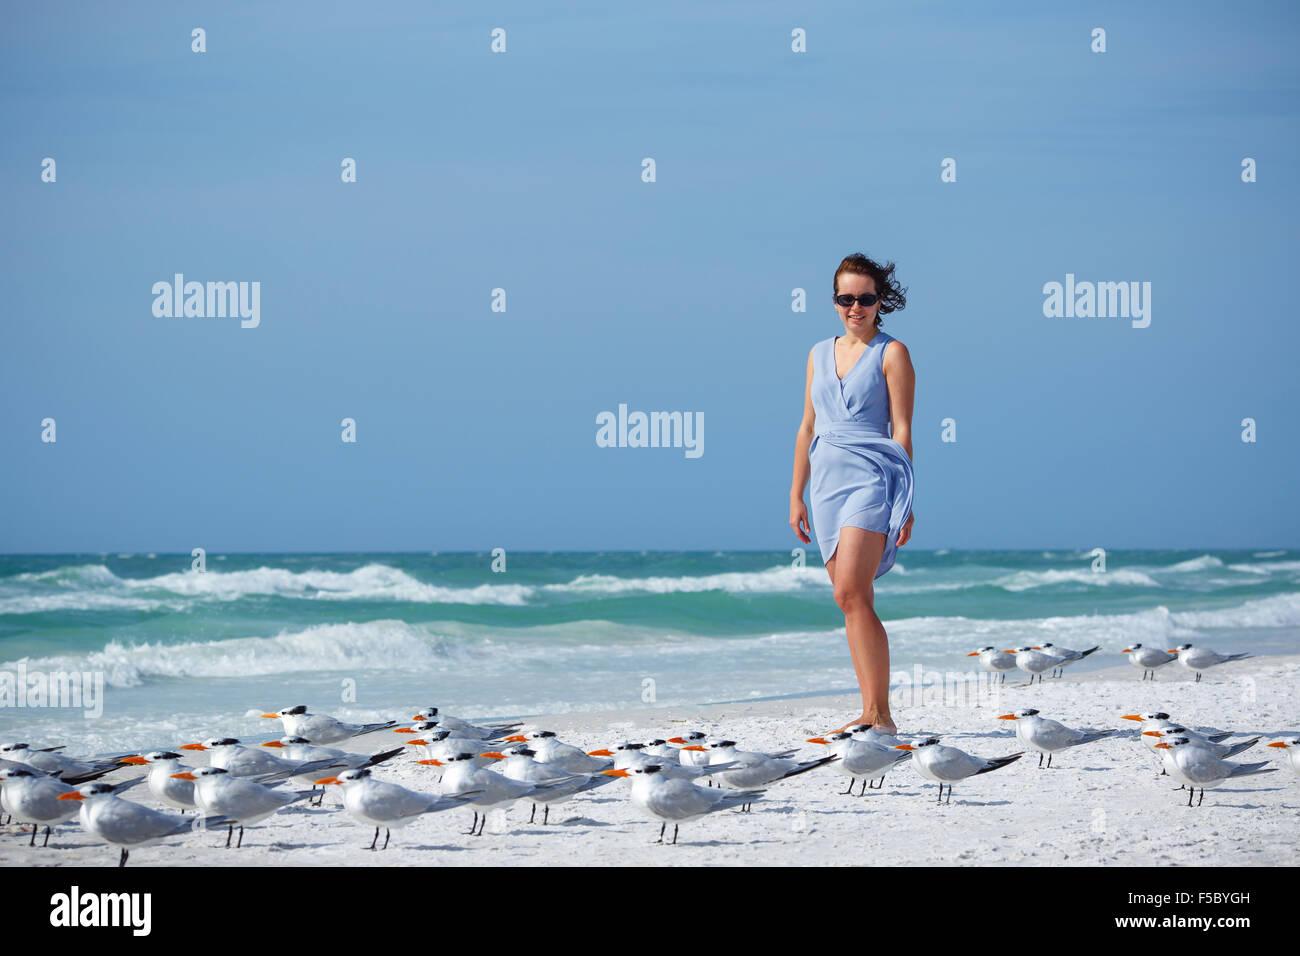 Young woman on Siesta Key beach, Florida - Stock Image